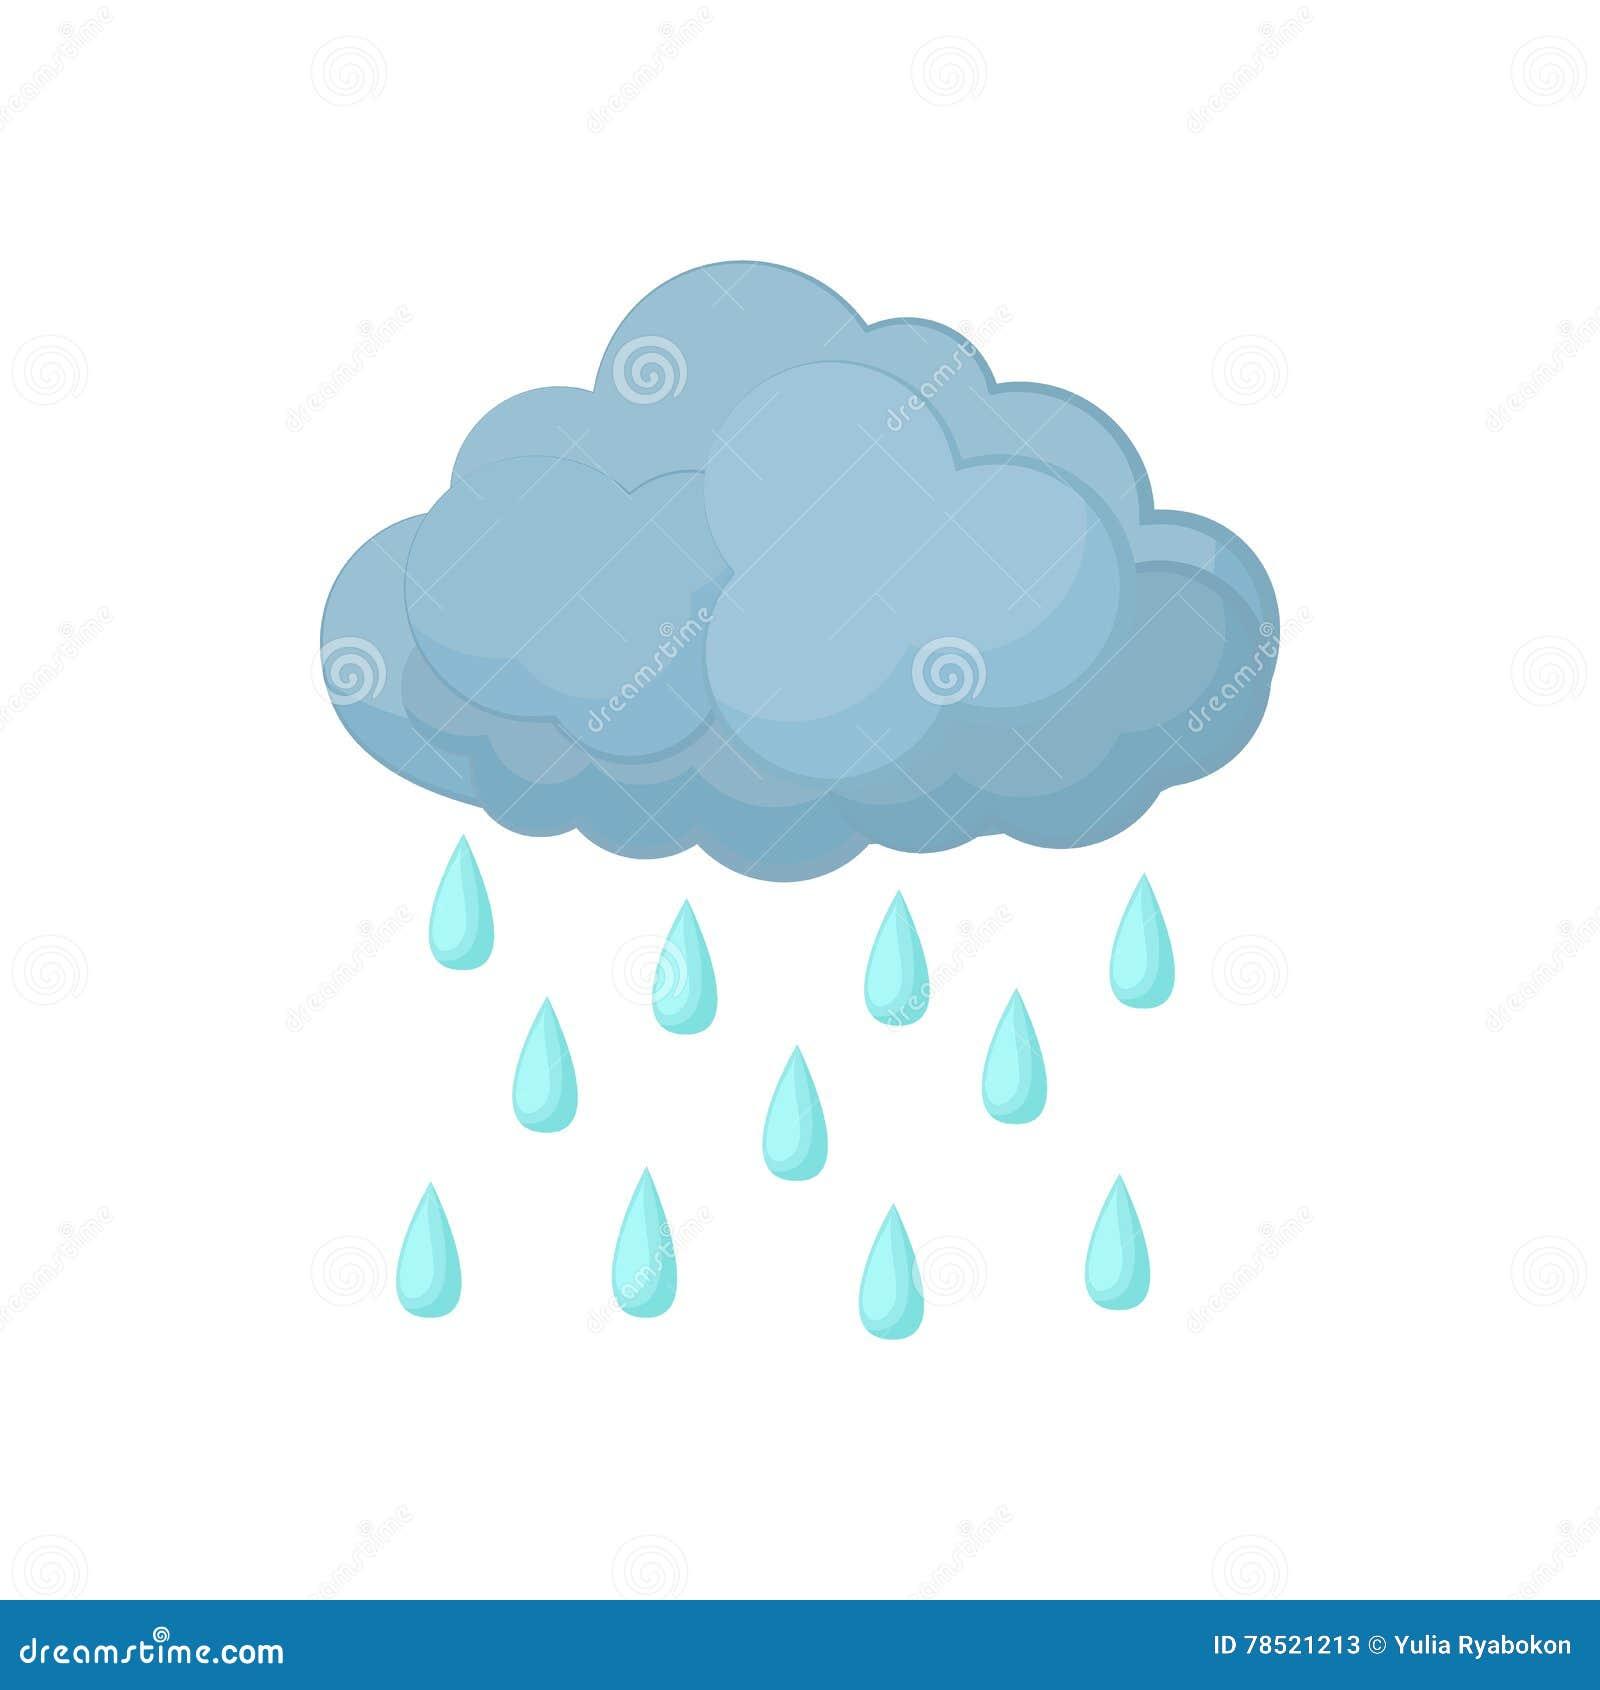 cartoon rain pictures to pin on pinterest pinsdaddy rain cloud clipart images rain cloud clipart no background